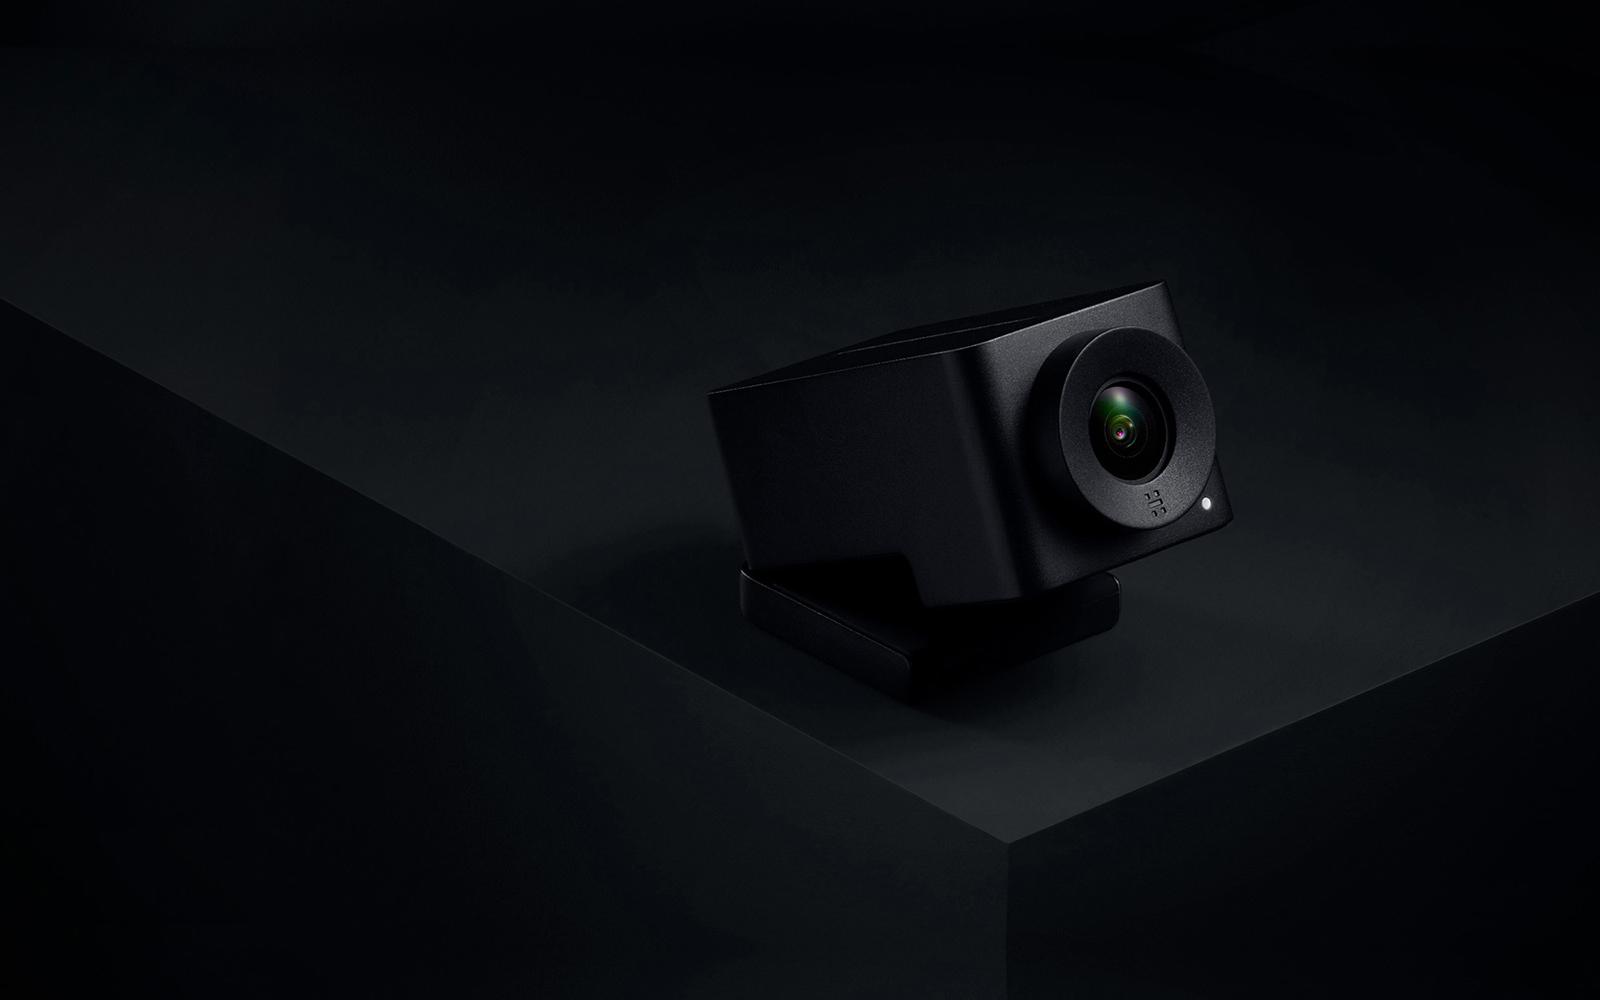 Huddy哈迪集团启用全新的品牌形象与VI系统设计-VI设计05